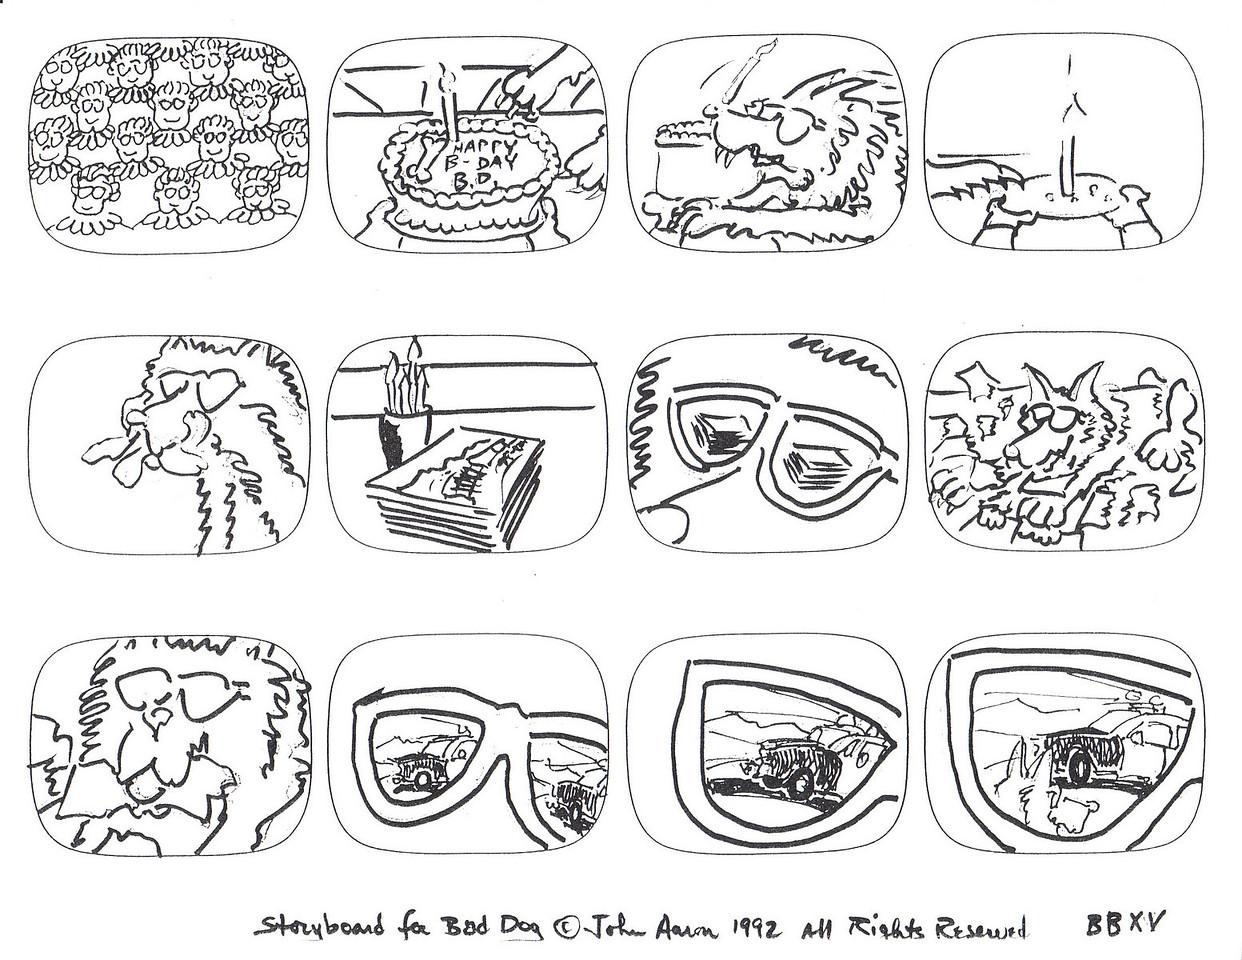 """BAAD DOG"" ANIMATED SERIES STORYBOARDS- INK JOHN AARON- ARTIST & CREATOR Designed for MODERN ARF ENTERTAINMENT"